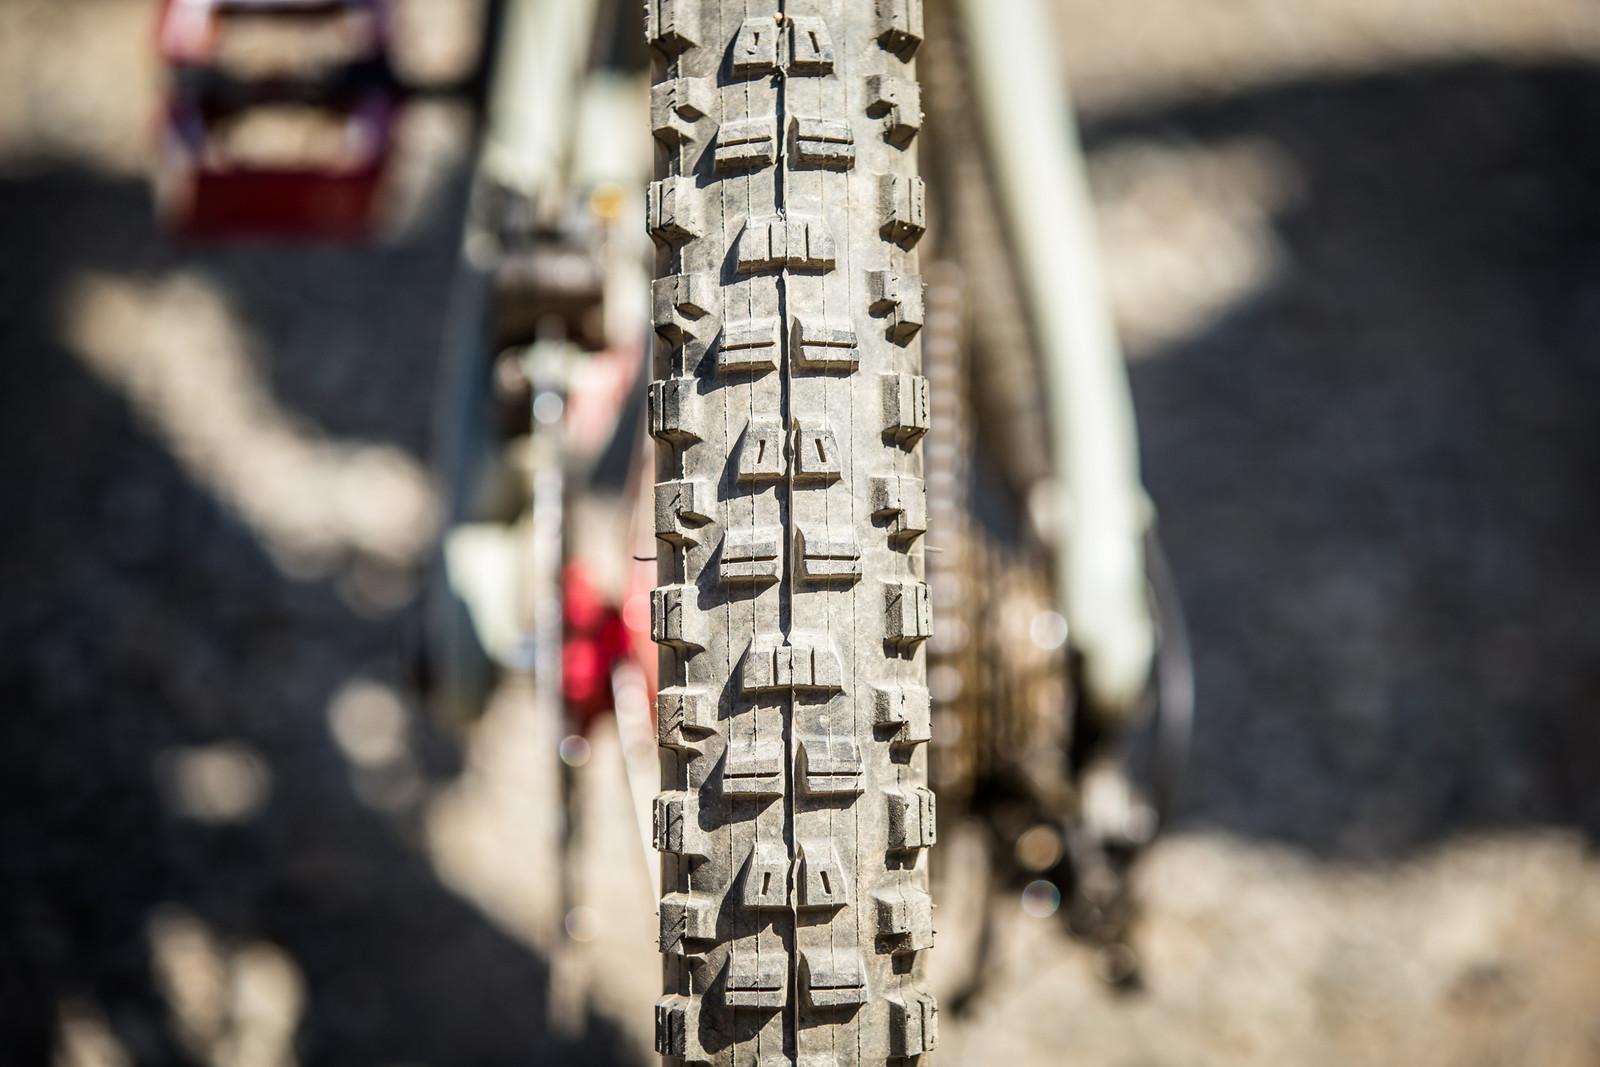 Maxxis Minion DHR II Rear Tire - WINNING BIKE - Loris Vergier's Santa Cruz V10cc 29 - Mountain Biking Pictures - Vital MTB